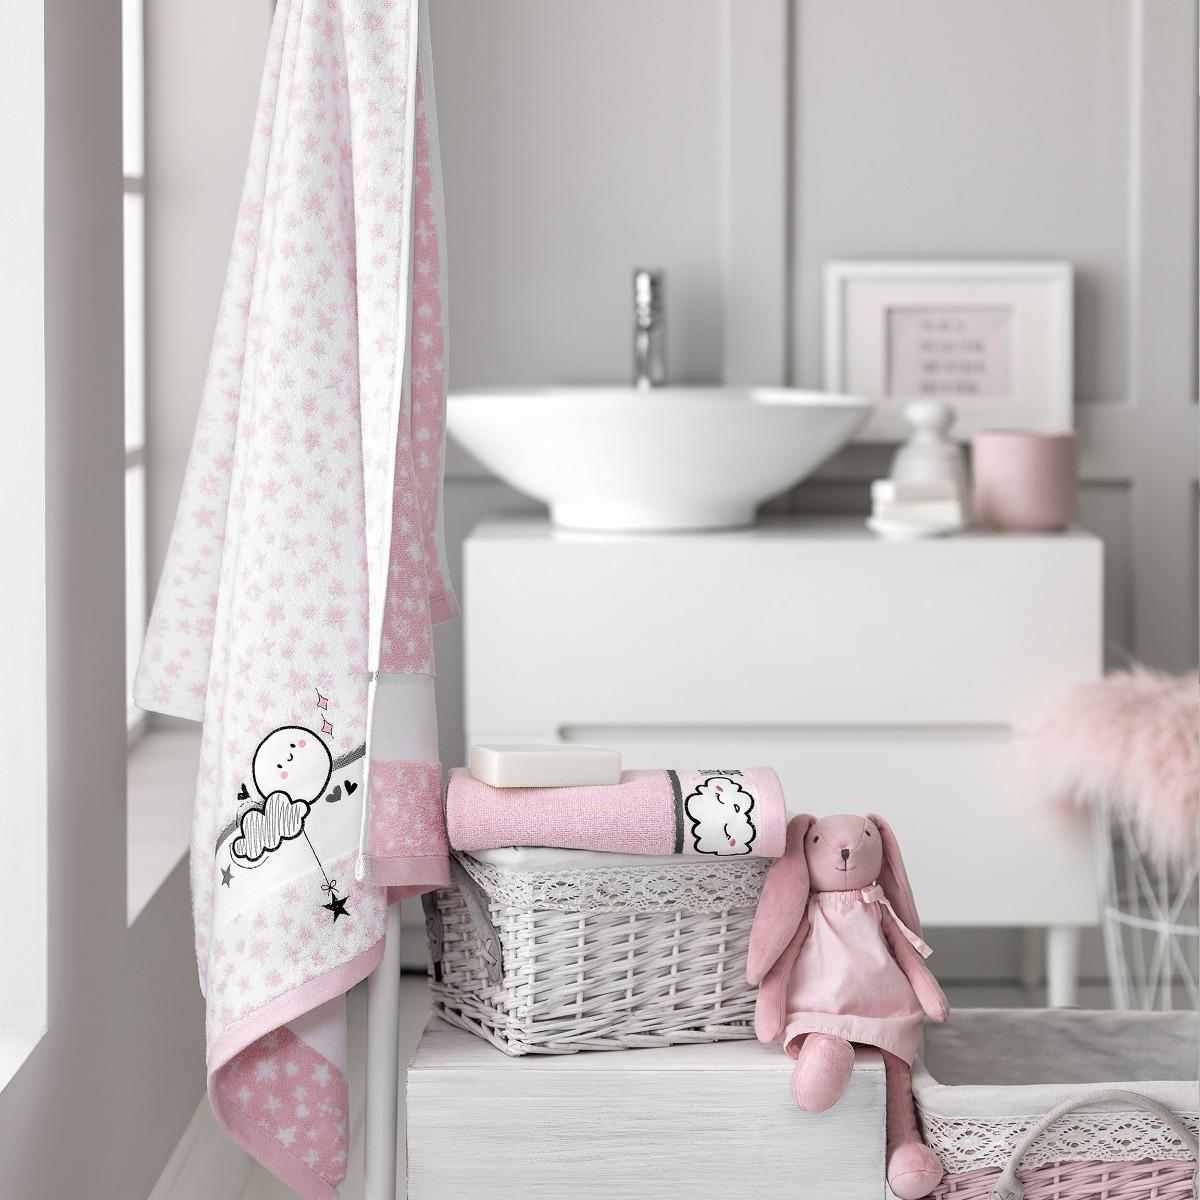 Фото - Комплект полотенец Togas Трейси белый/розовый 2 пр 50х75/70х130 комплект полотенец togas миэль темно серый 2 пр 50х100 70х140